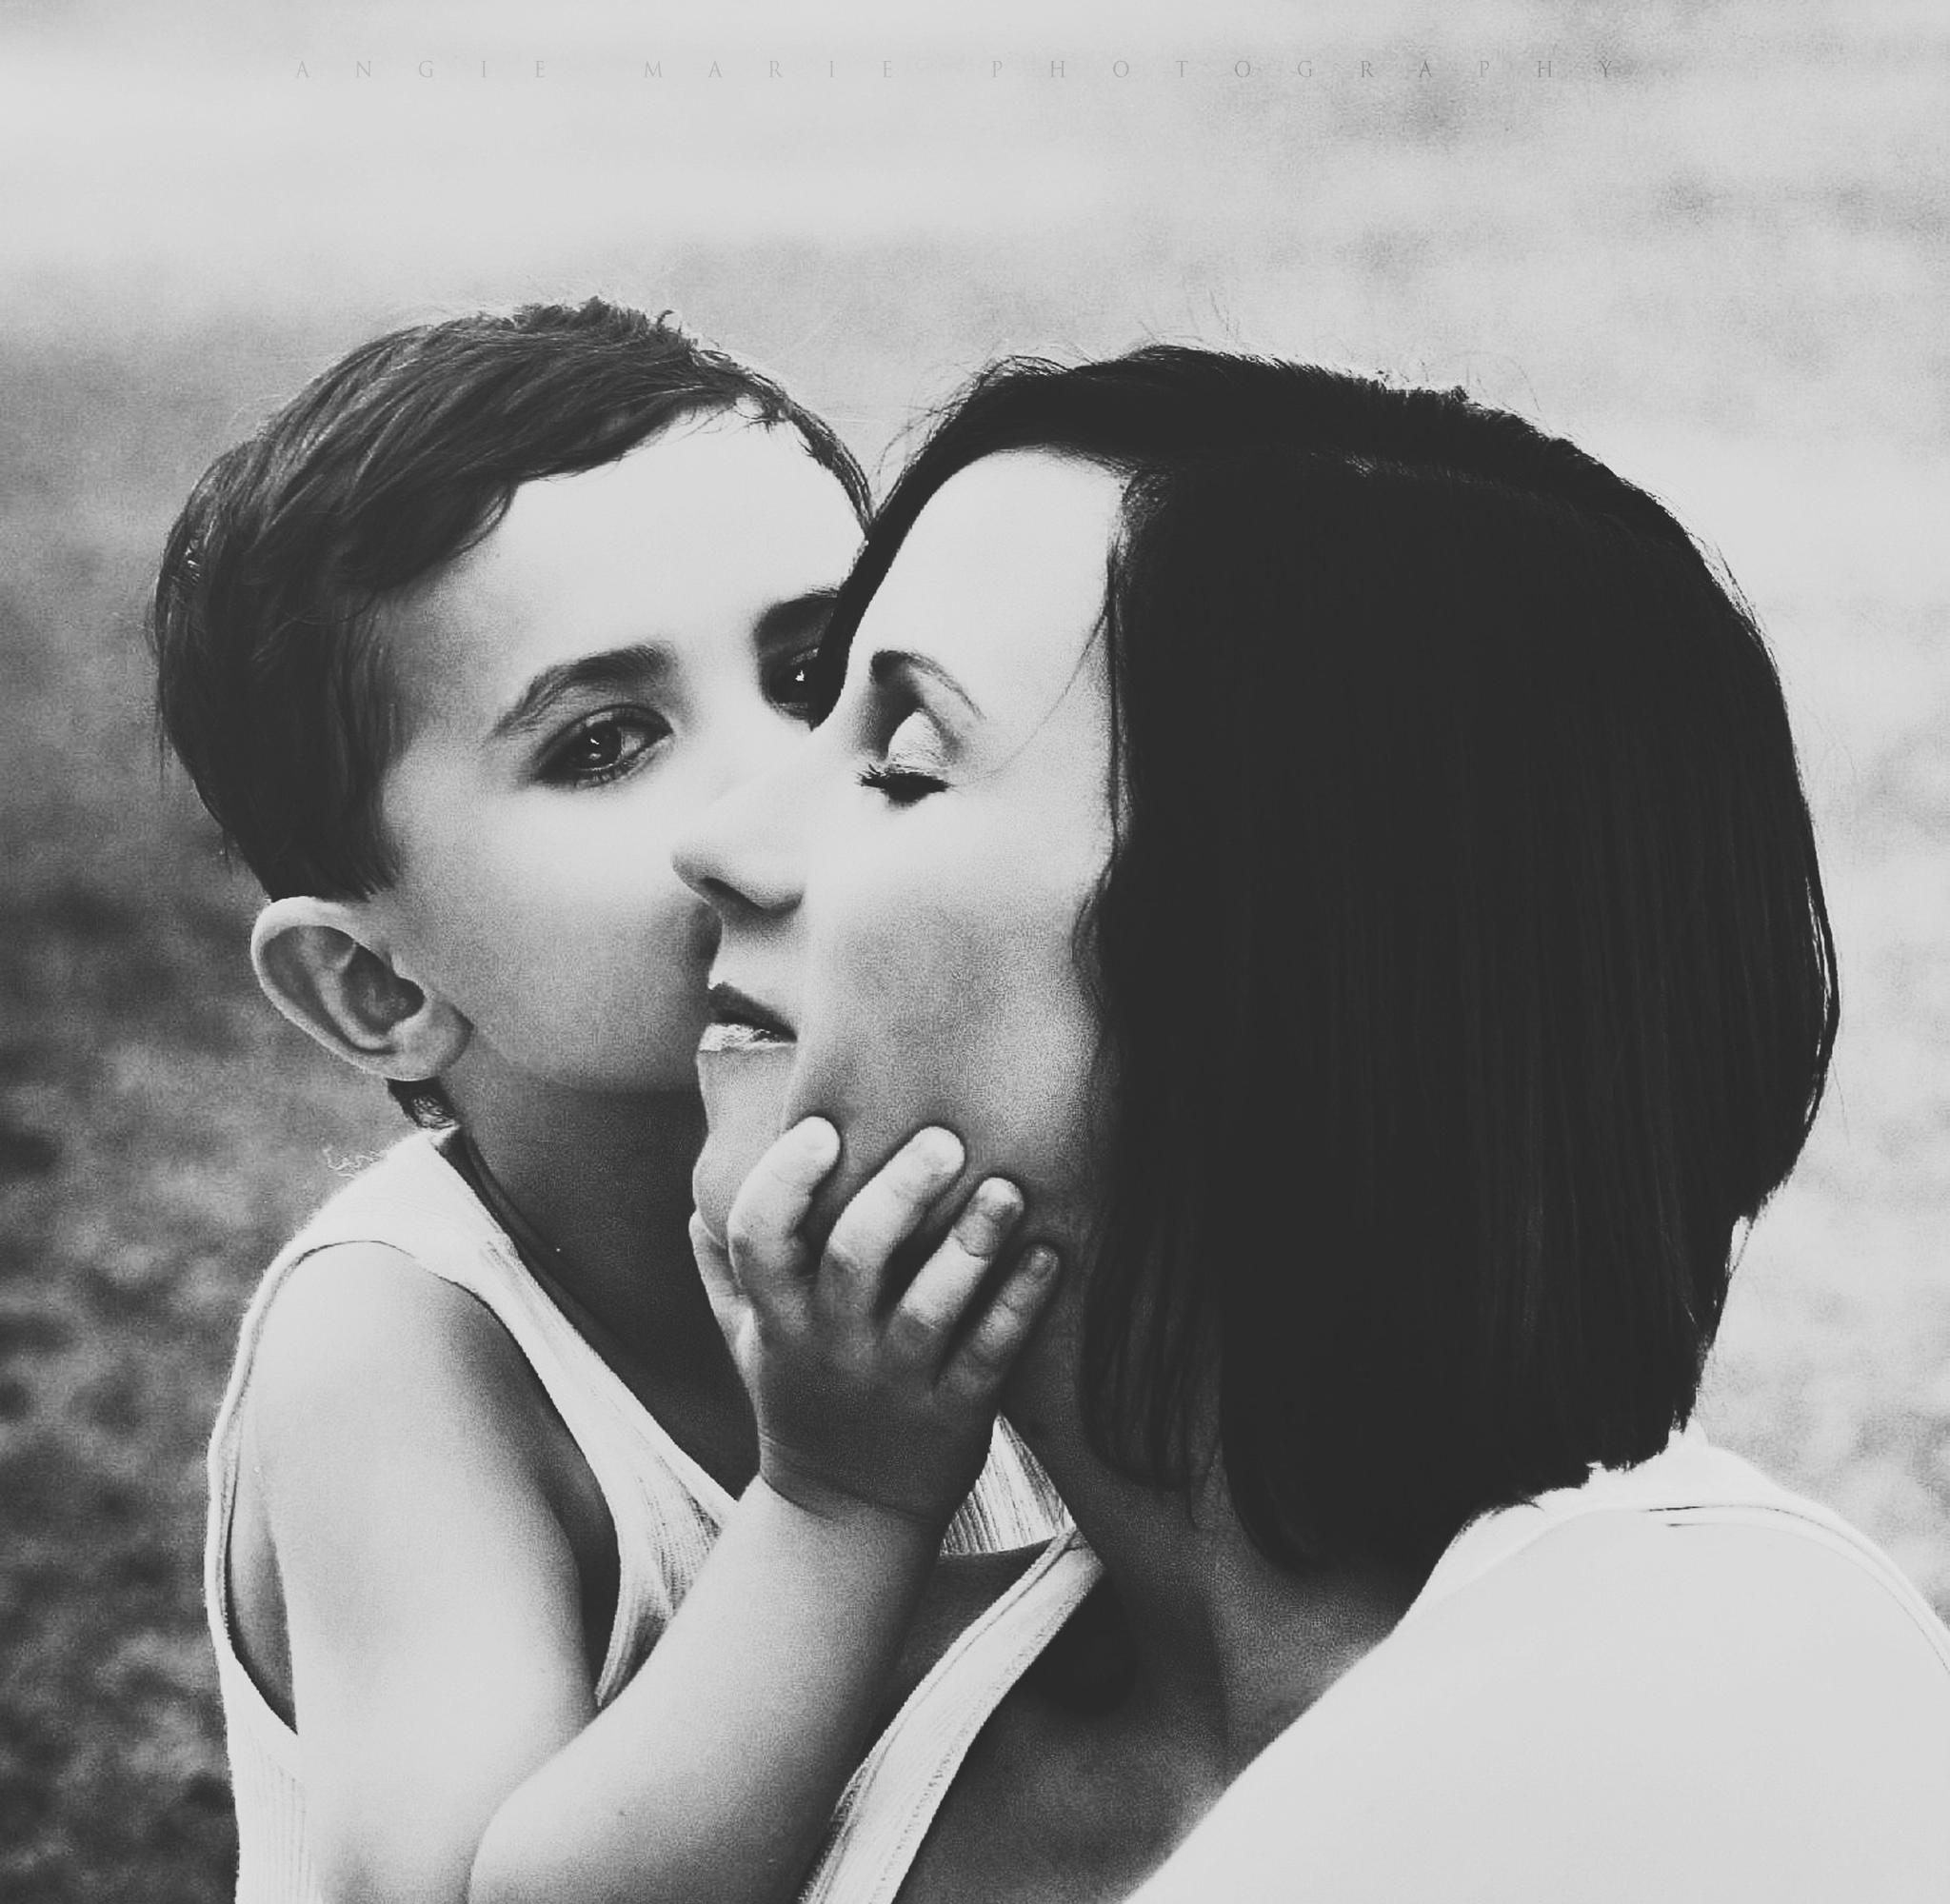 Weekly Monday Contest: Motherhood Photos + New Theme